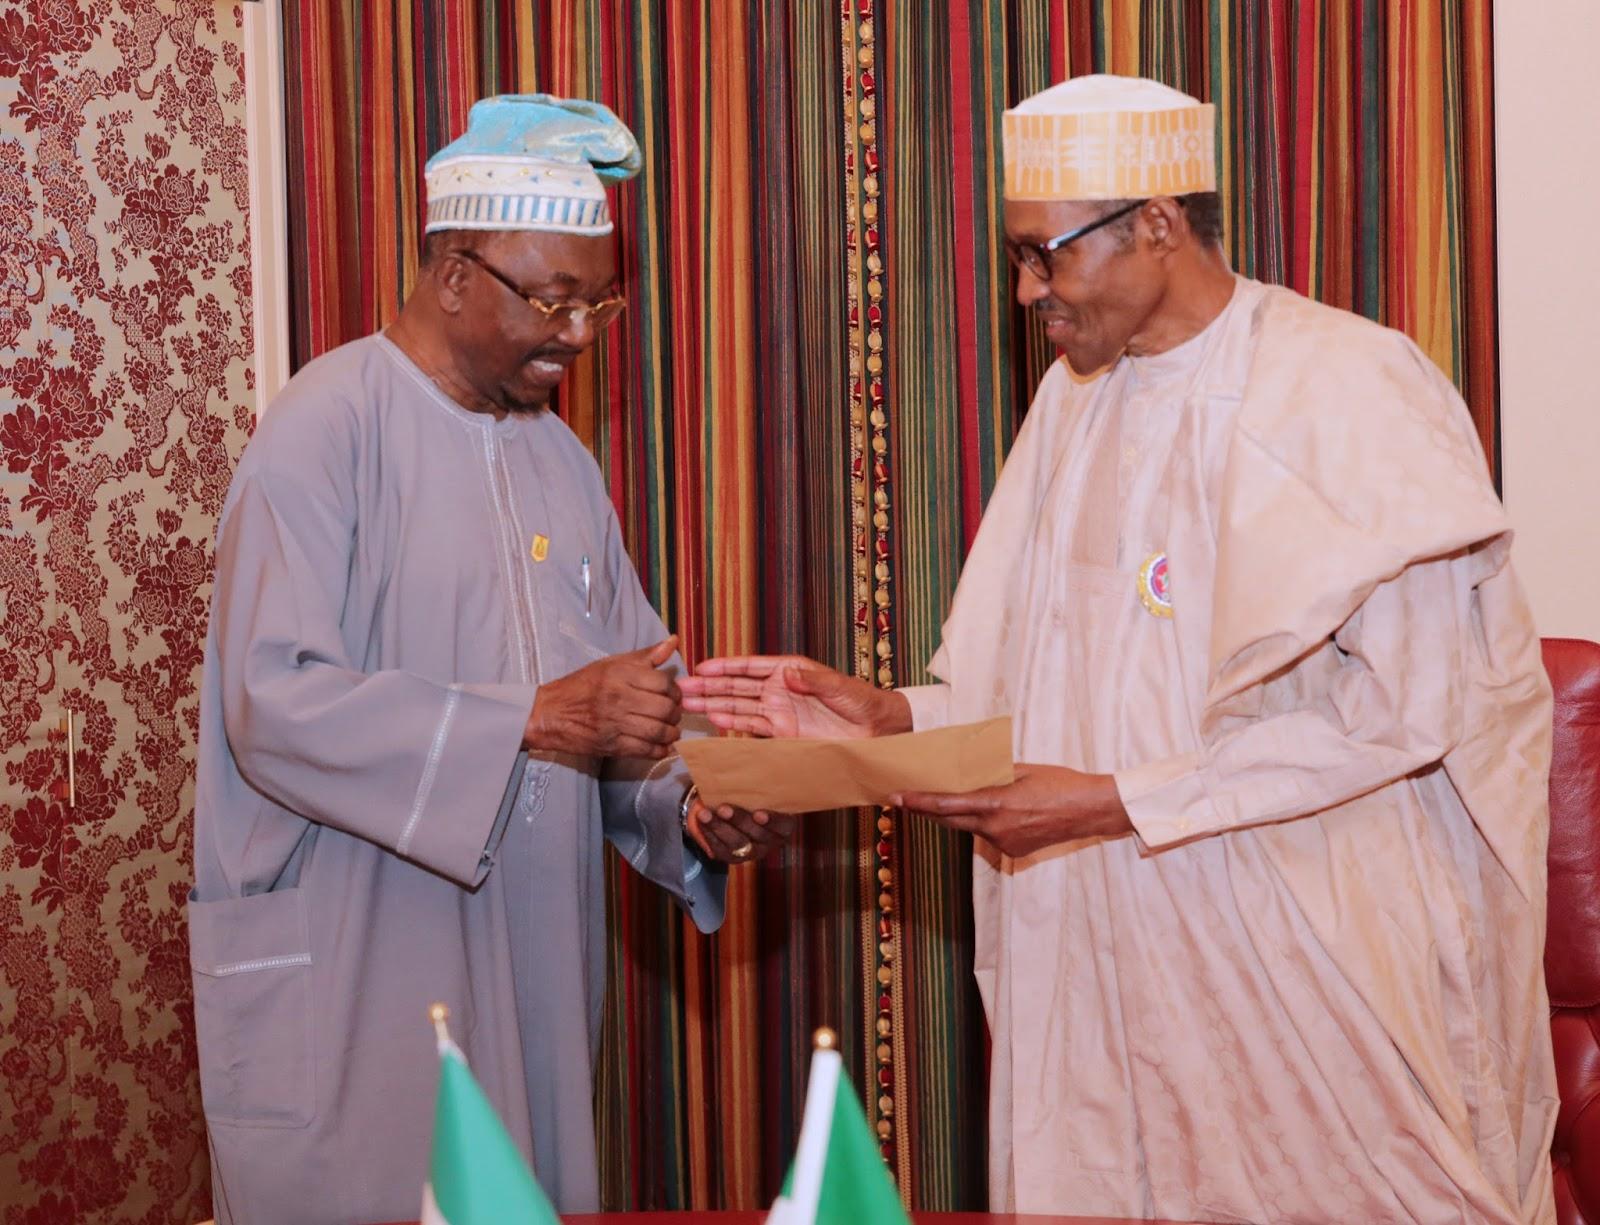 President Buhari with Senator Durojaiye after the